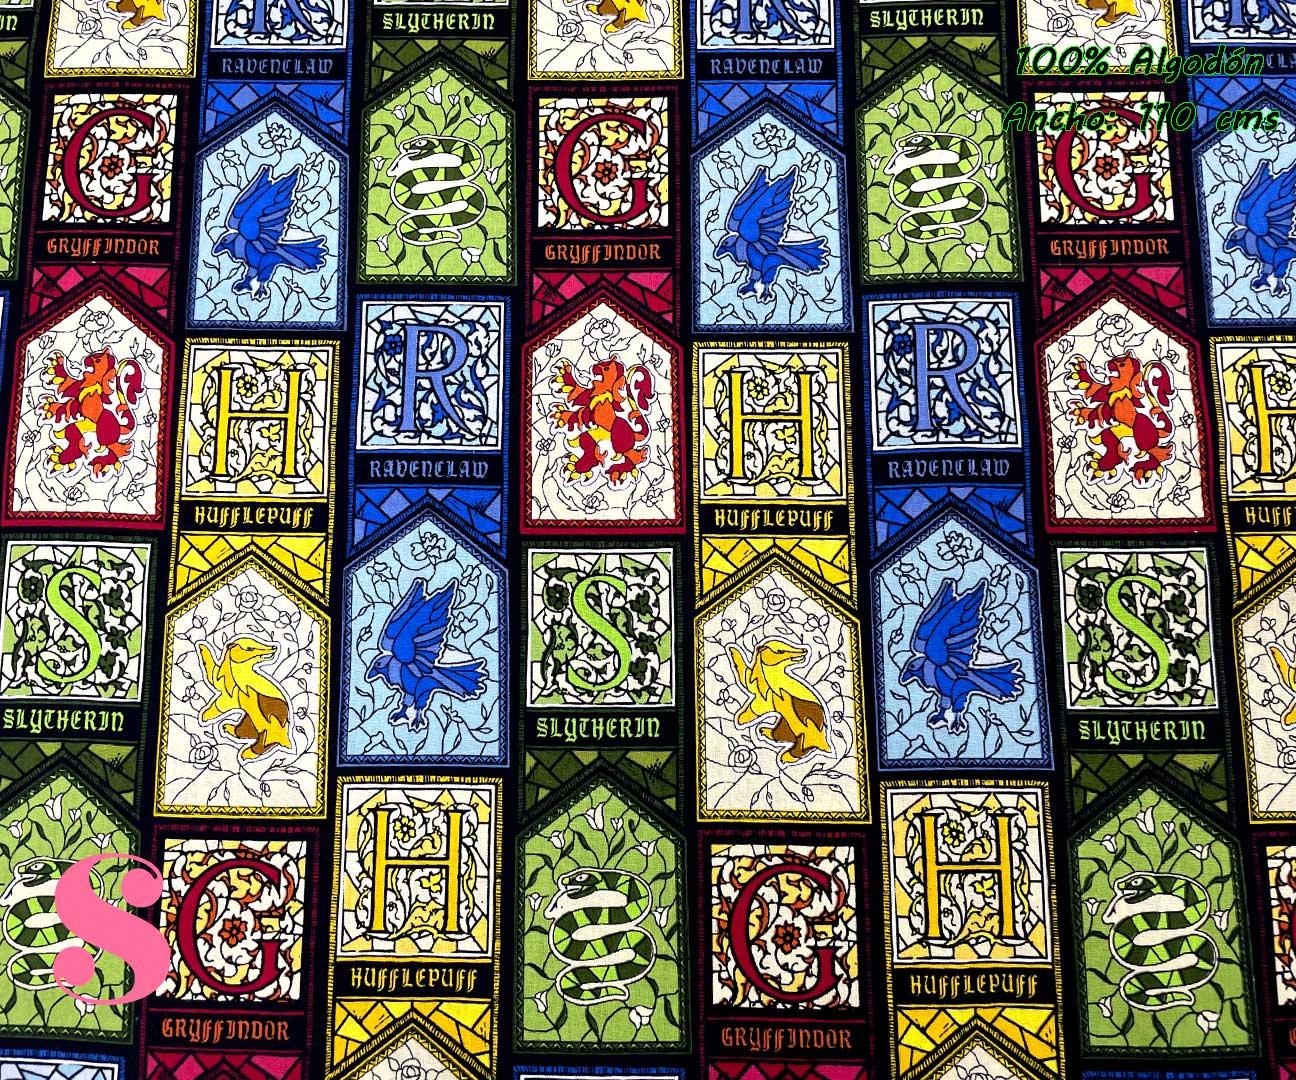 8-telas-frikis,telas-harry-potter-originales,telas-camelot,estampados-originales-harry-potter,Tejido Estampado Patch Americano Harry Potter Vidriera Casas de Hogwarts